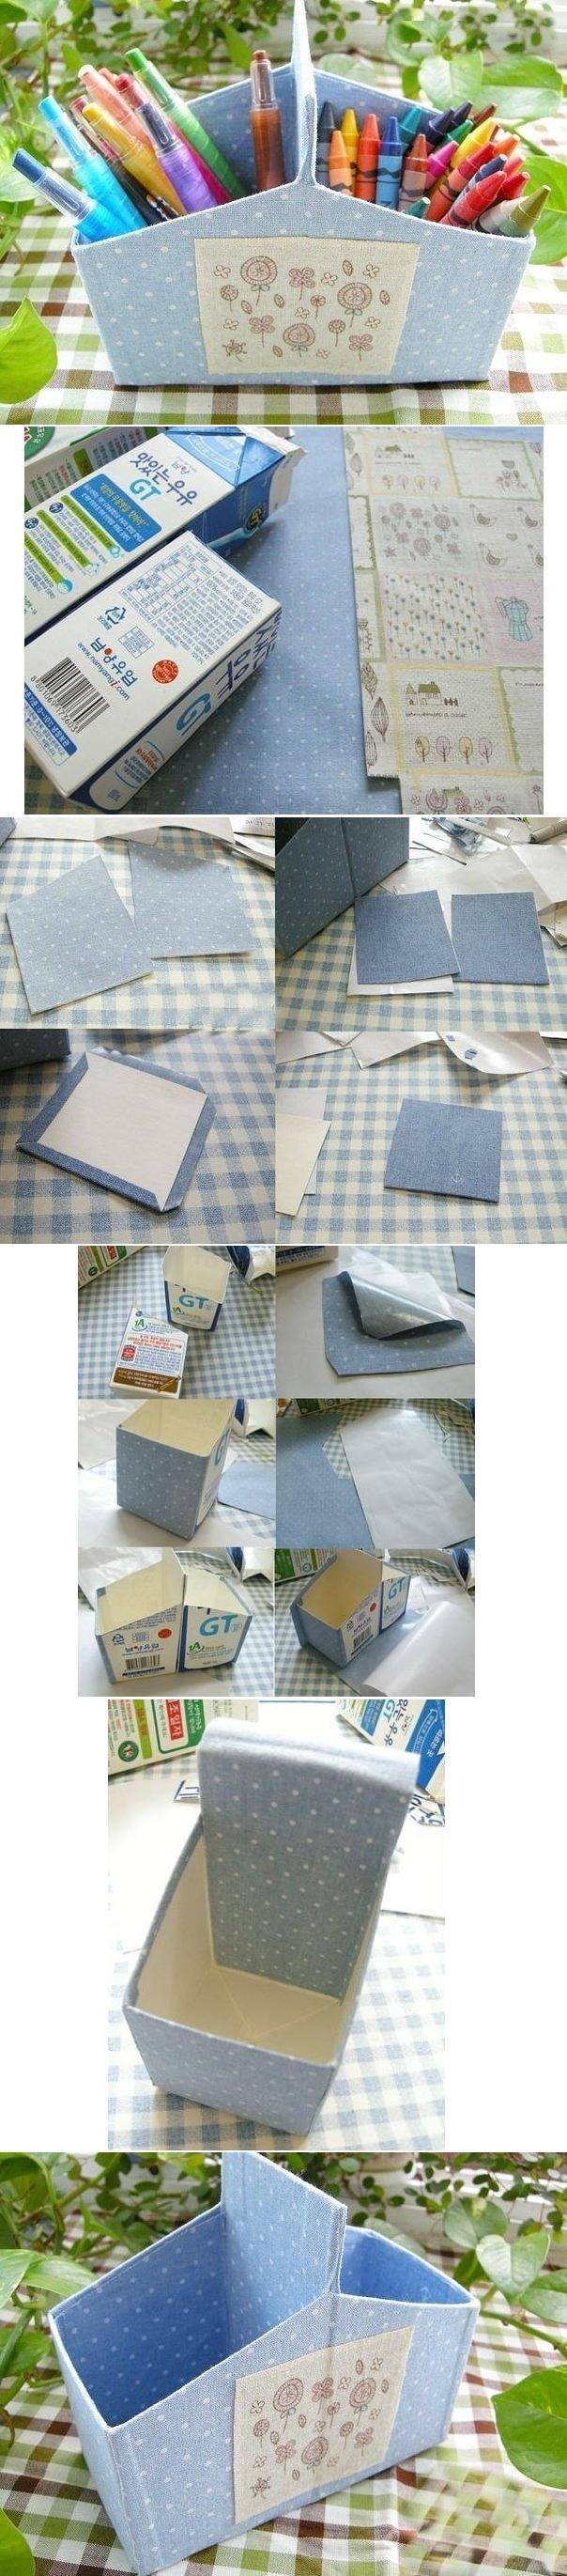 DIY Milk Carton Organizer DIY Projects | UsefulDIY.com